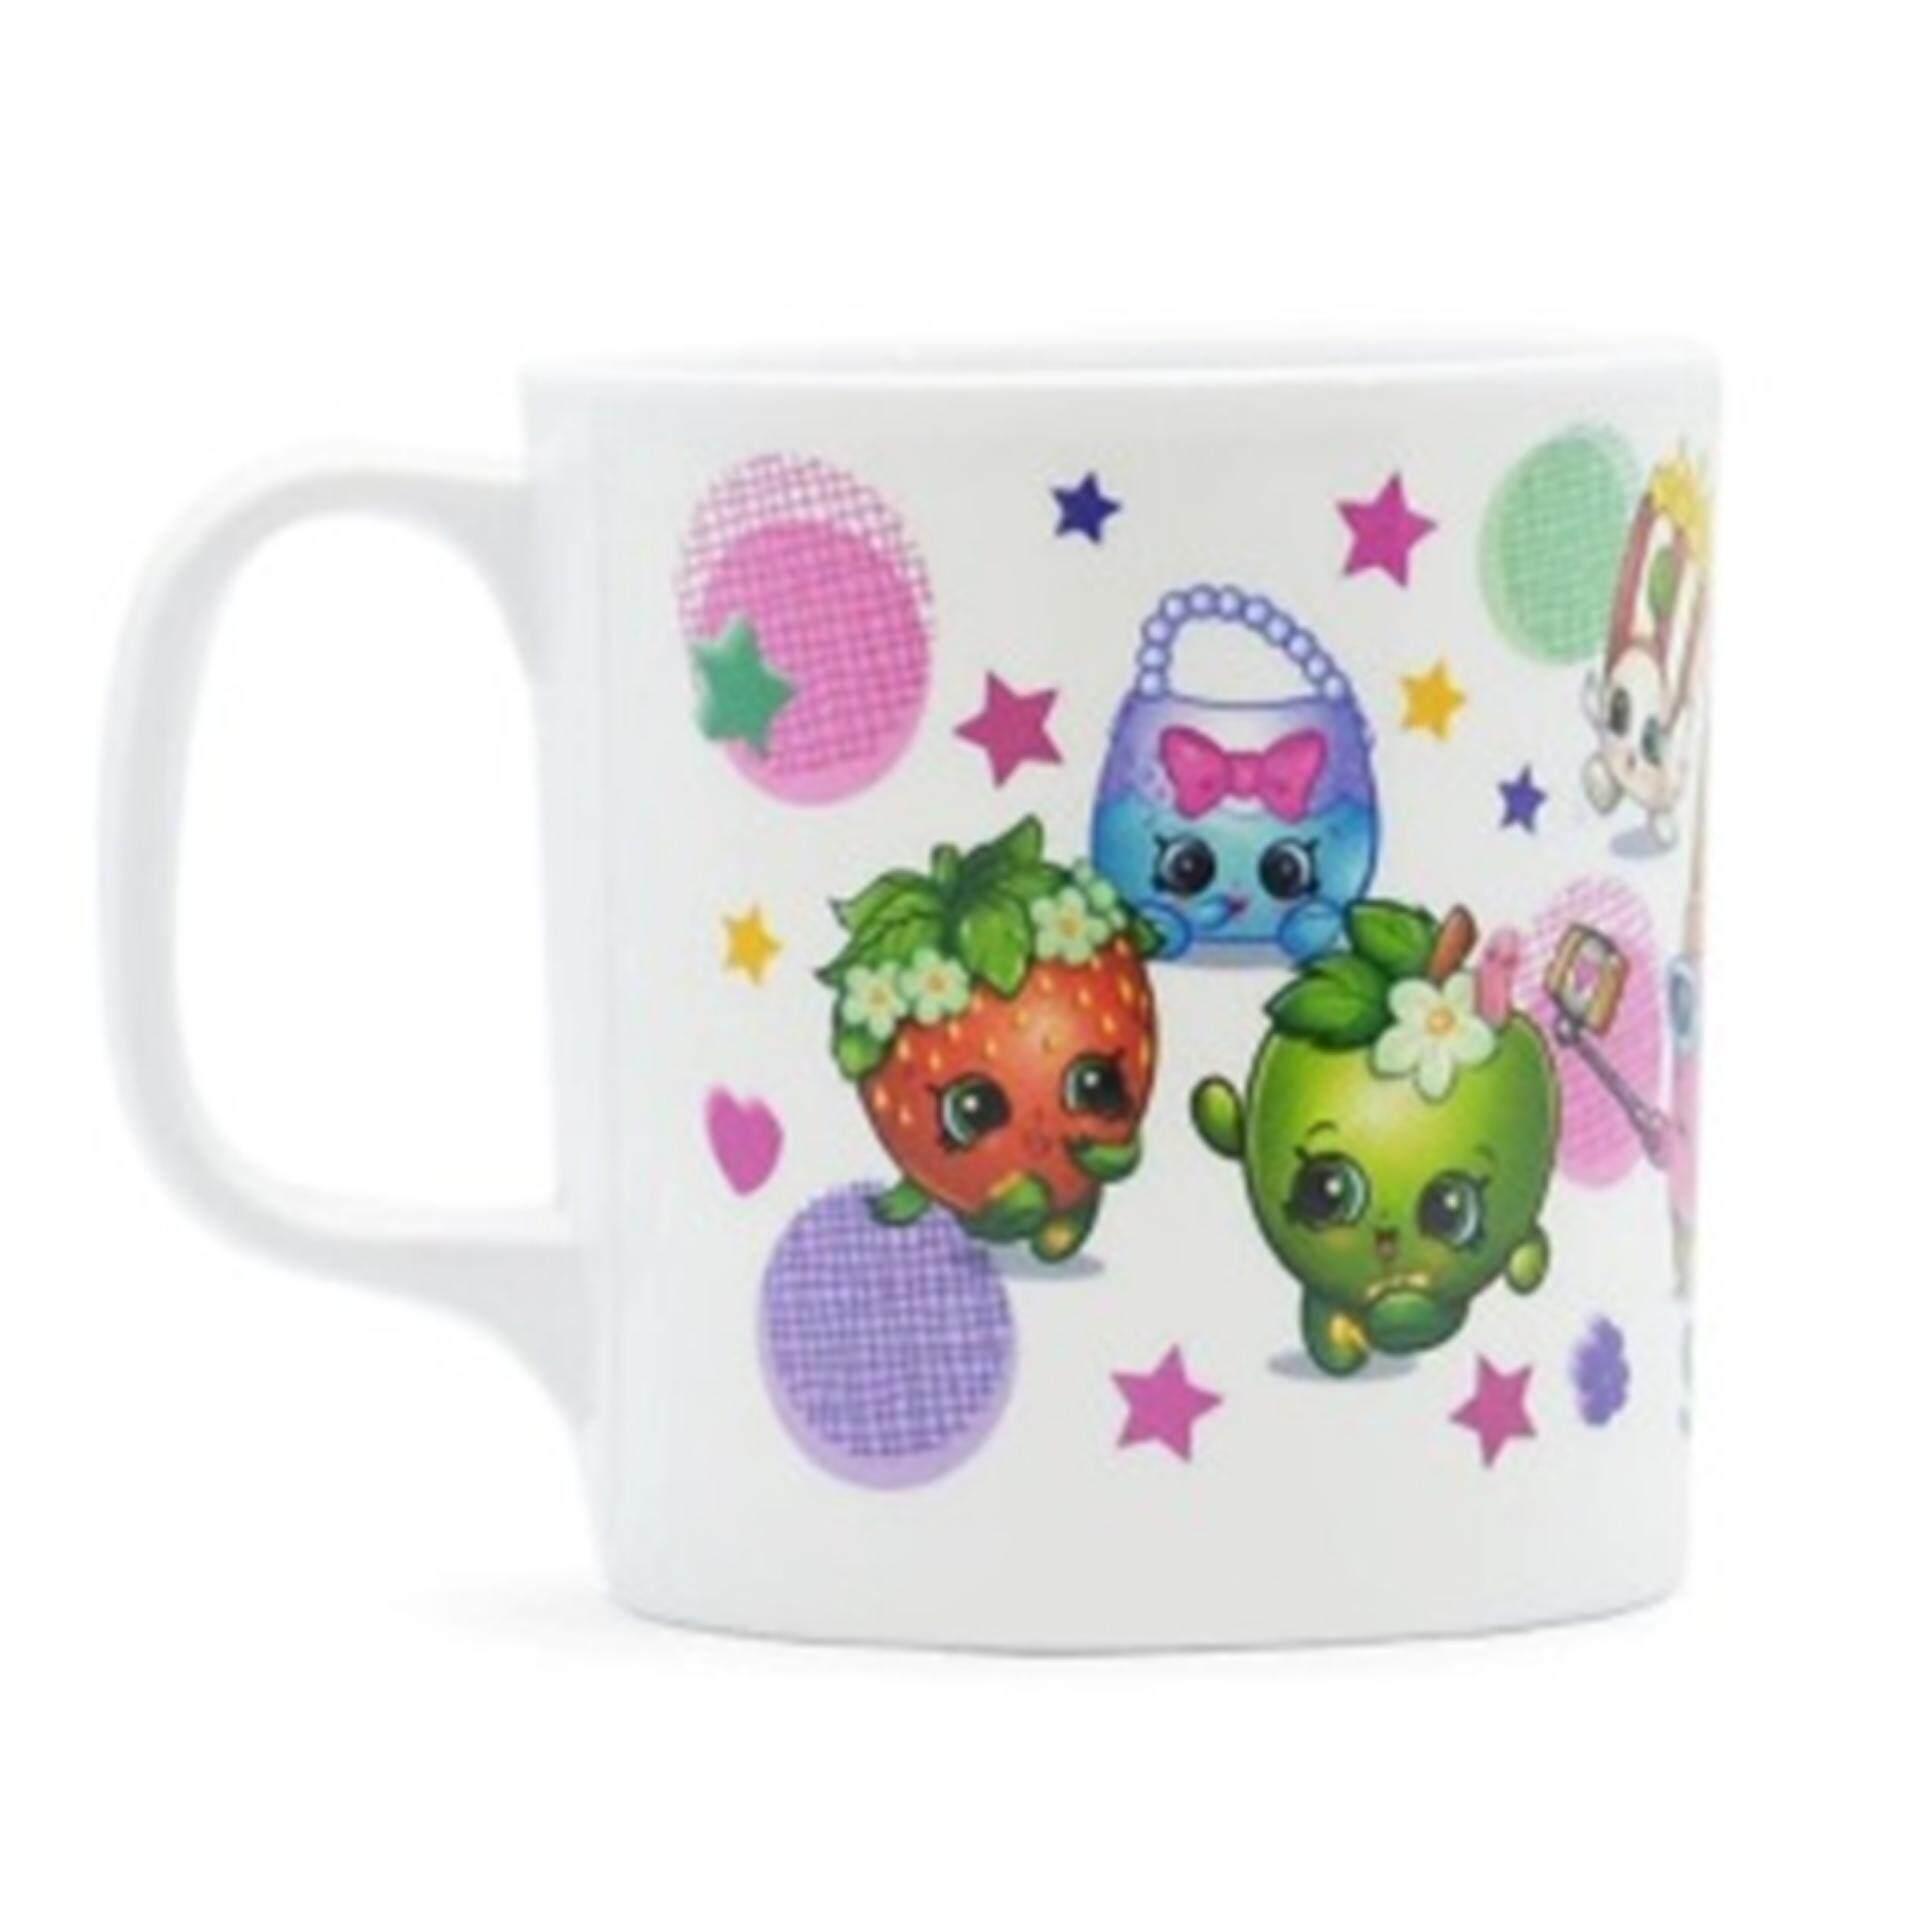 Shopkins Cup 3.5 Inches - Purple Colour